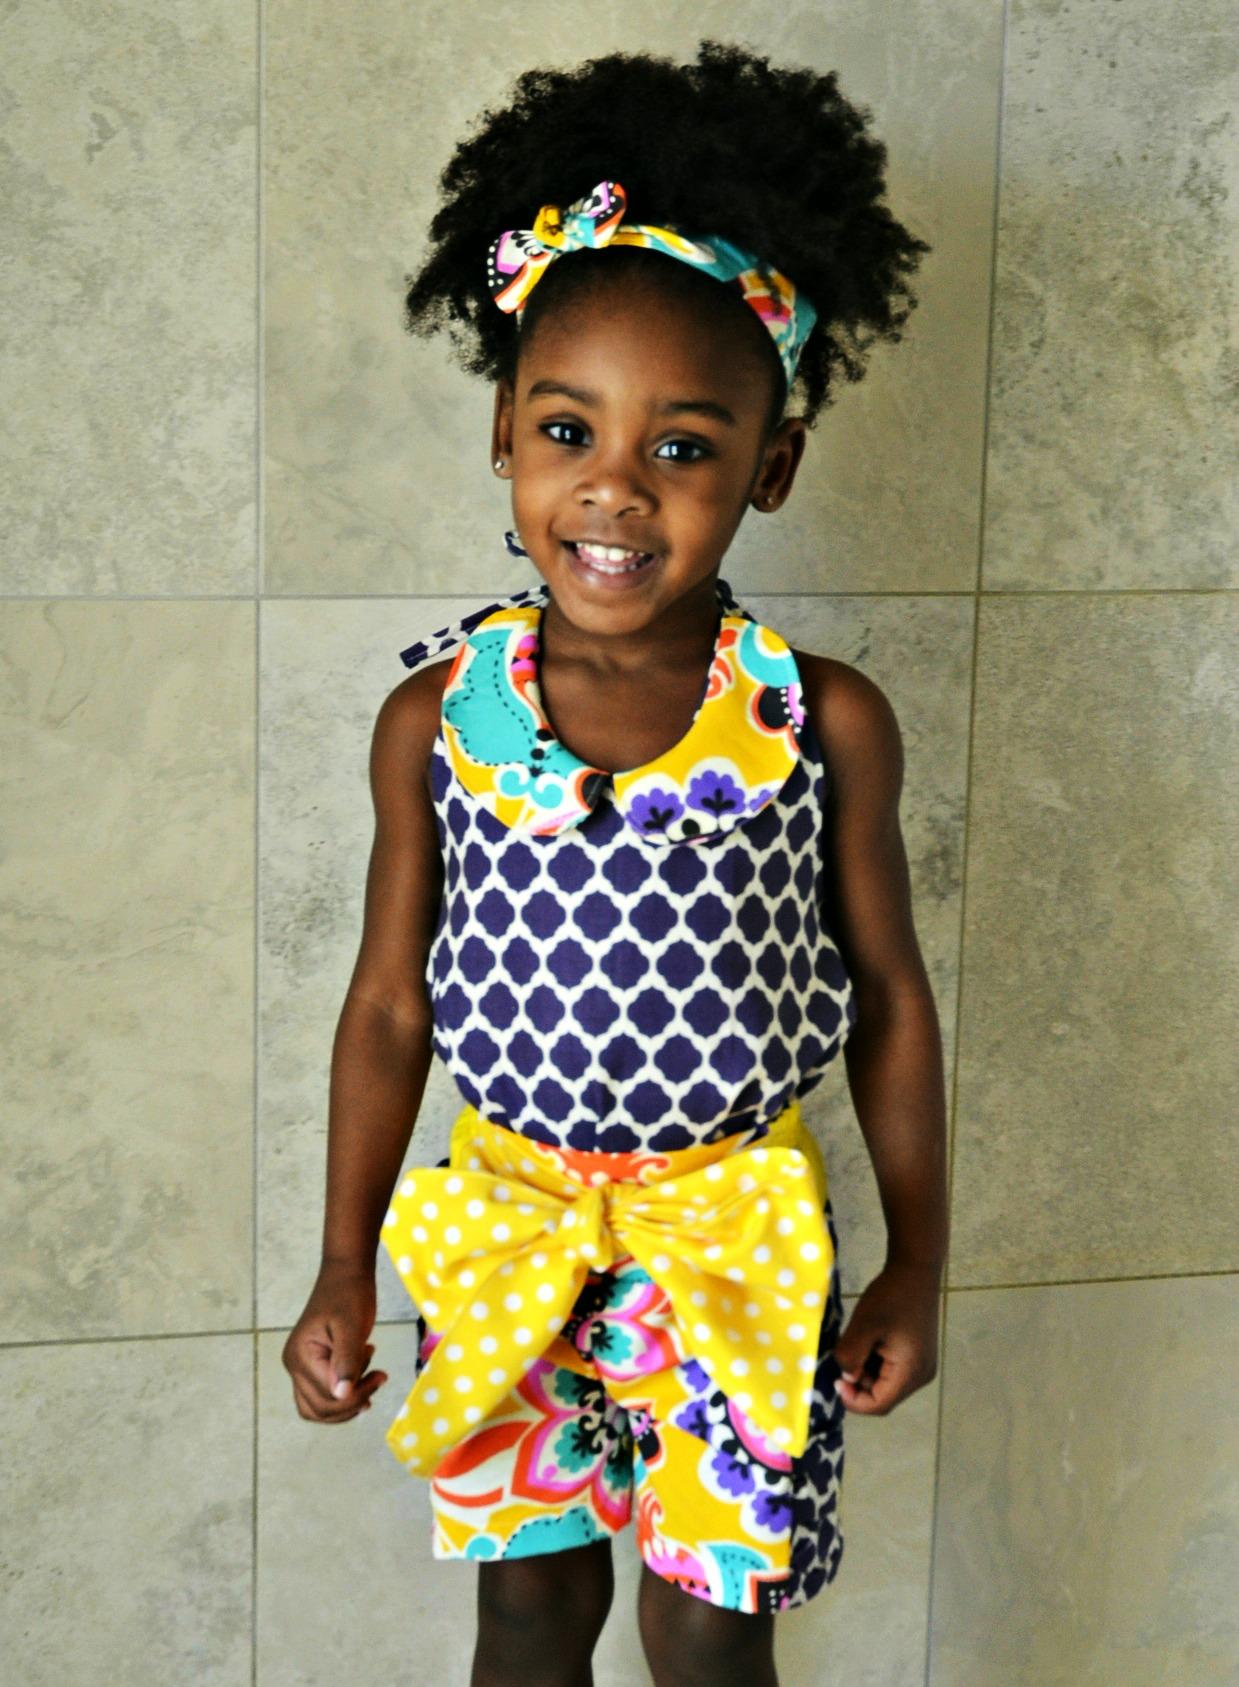 Rosalie's Ruched Shorts Sizes 6/12m to 8 Kids PDF Pattern